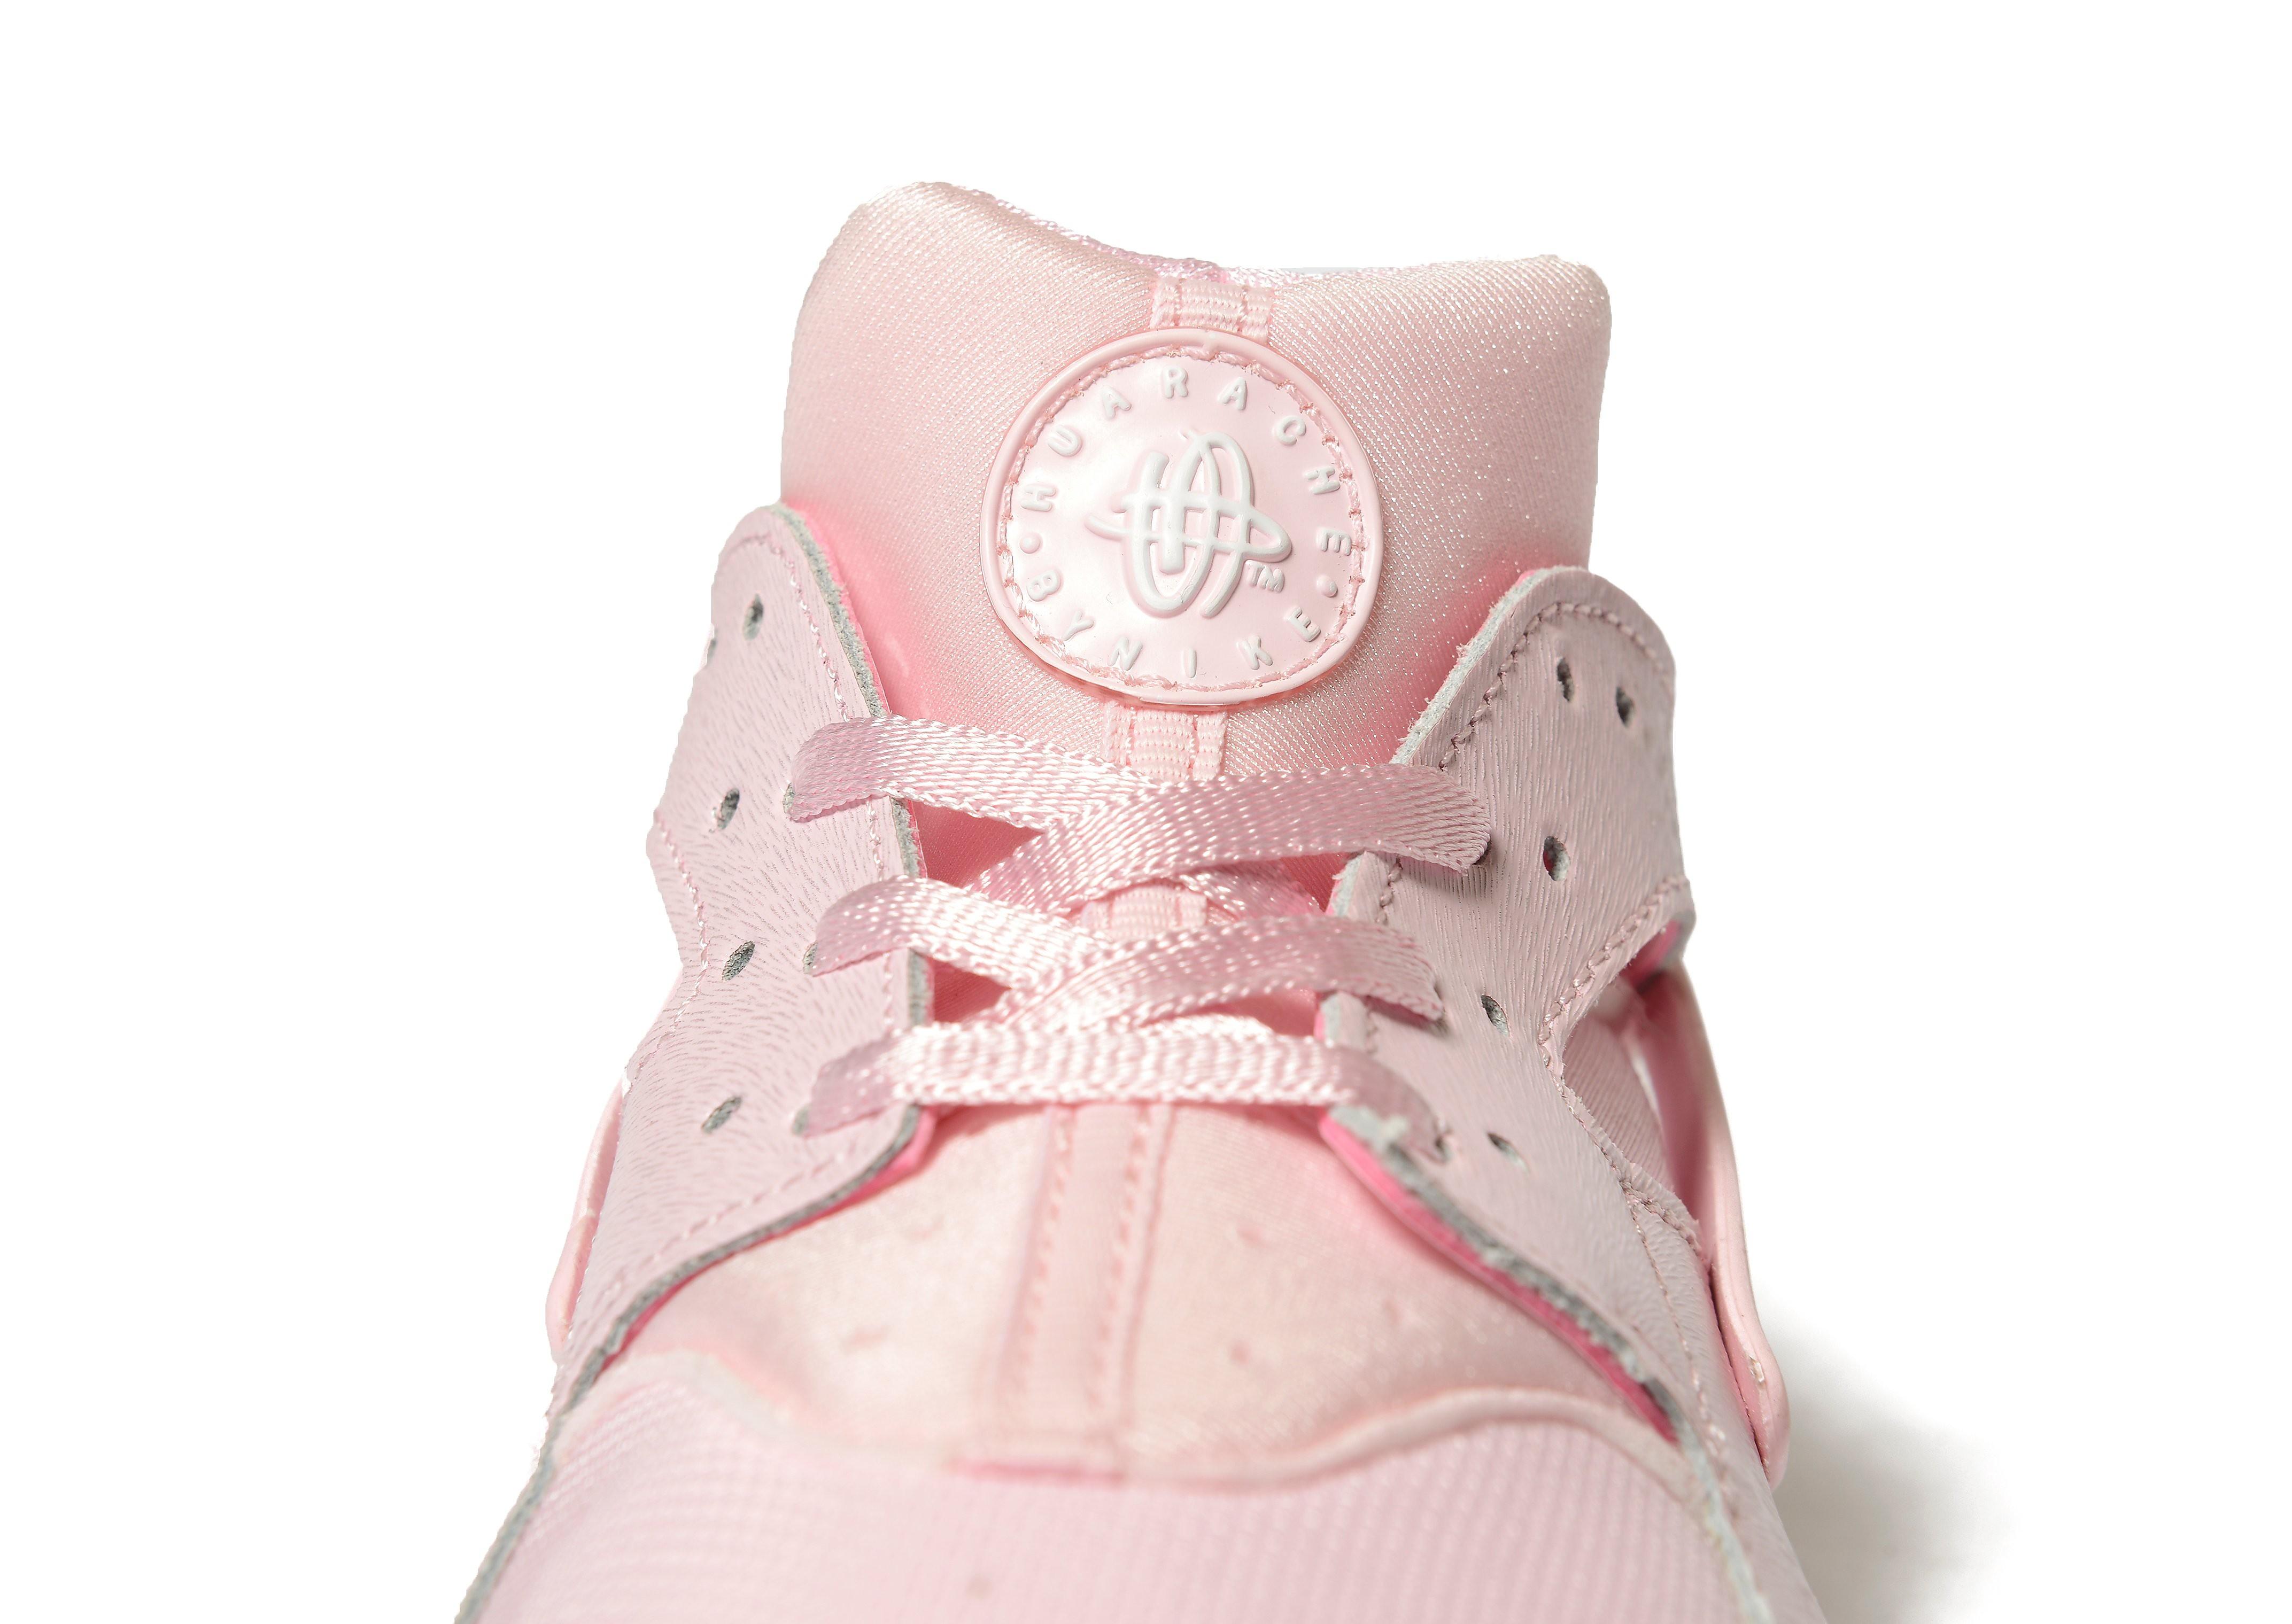 Nike Air Huarache SE Children